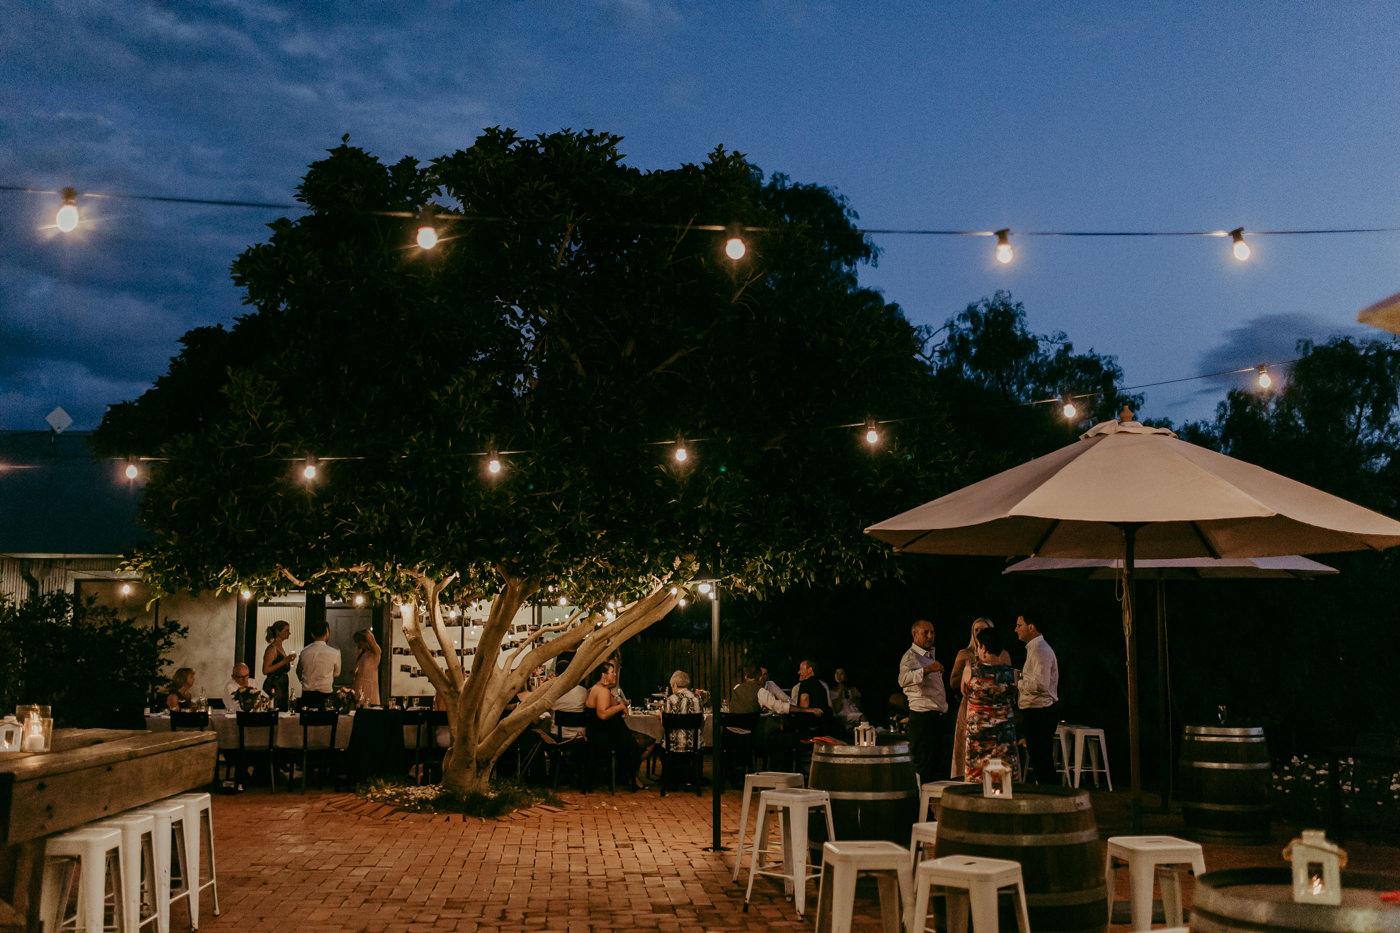 Anthony & Eliet - Wagga Wagga Wedding - Country NSW - Samantha Heather Photography-175.jpg